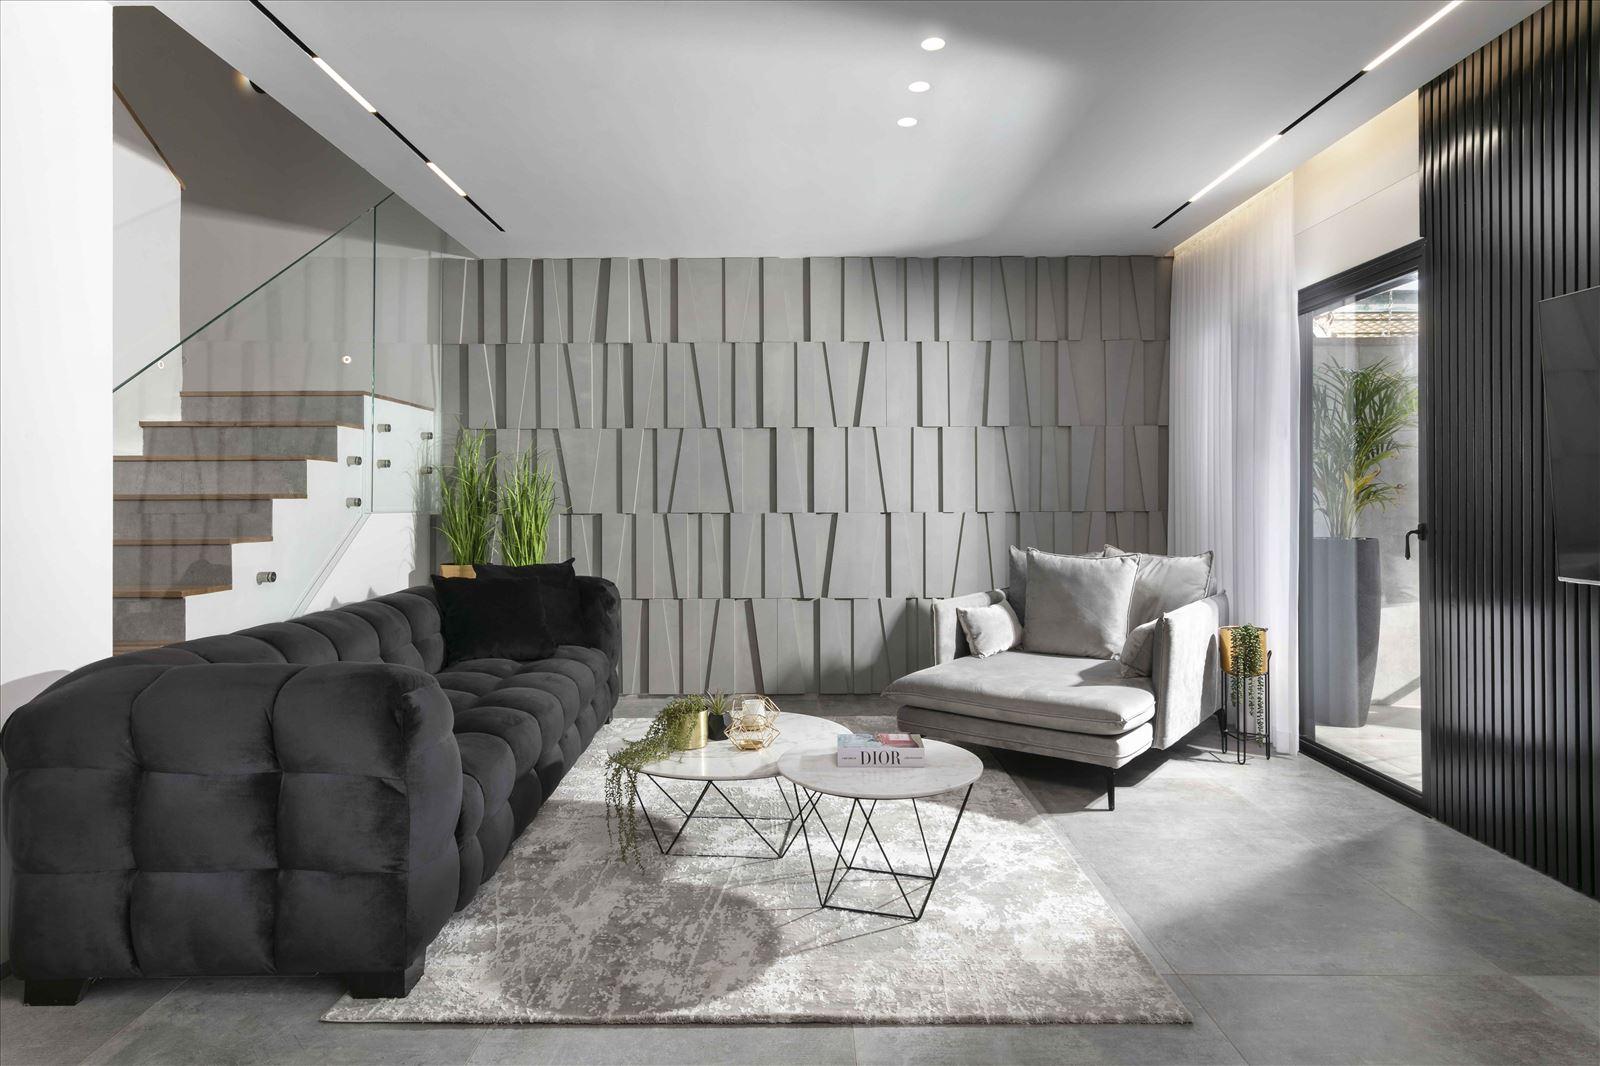 Lighting project private house תאורת הסלון בבית נעשתה על ידי קמחי תאורה